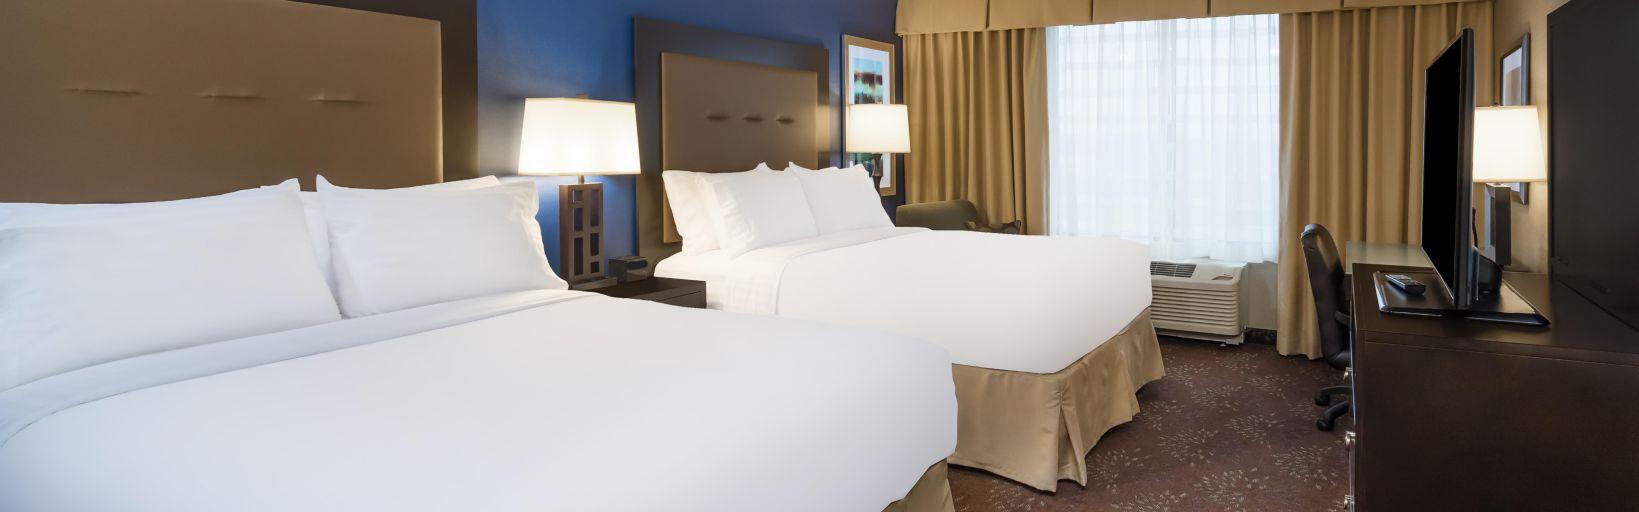 Holiday Inn Terre Haute - Hotel Reviews & Photos